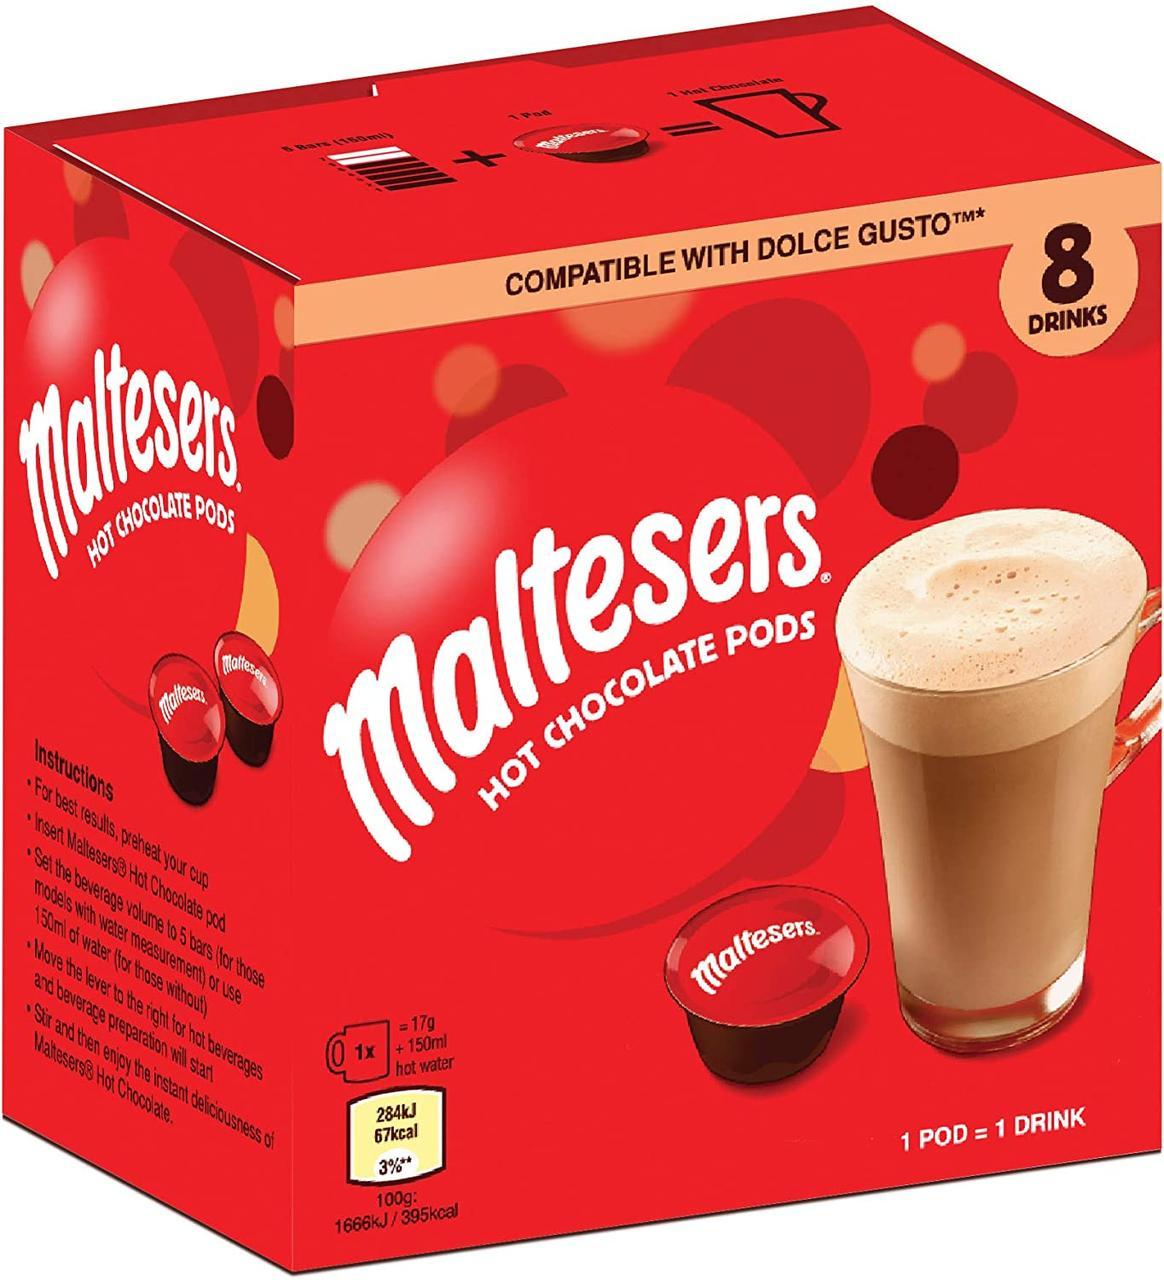 Dolce Gusto Maltesers - Mars  - ШОКОЛАД в капсулах Дольче Густо 8 порций